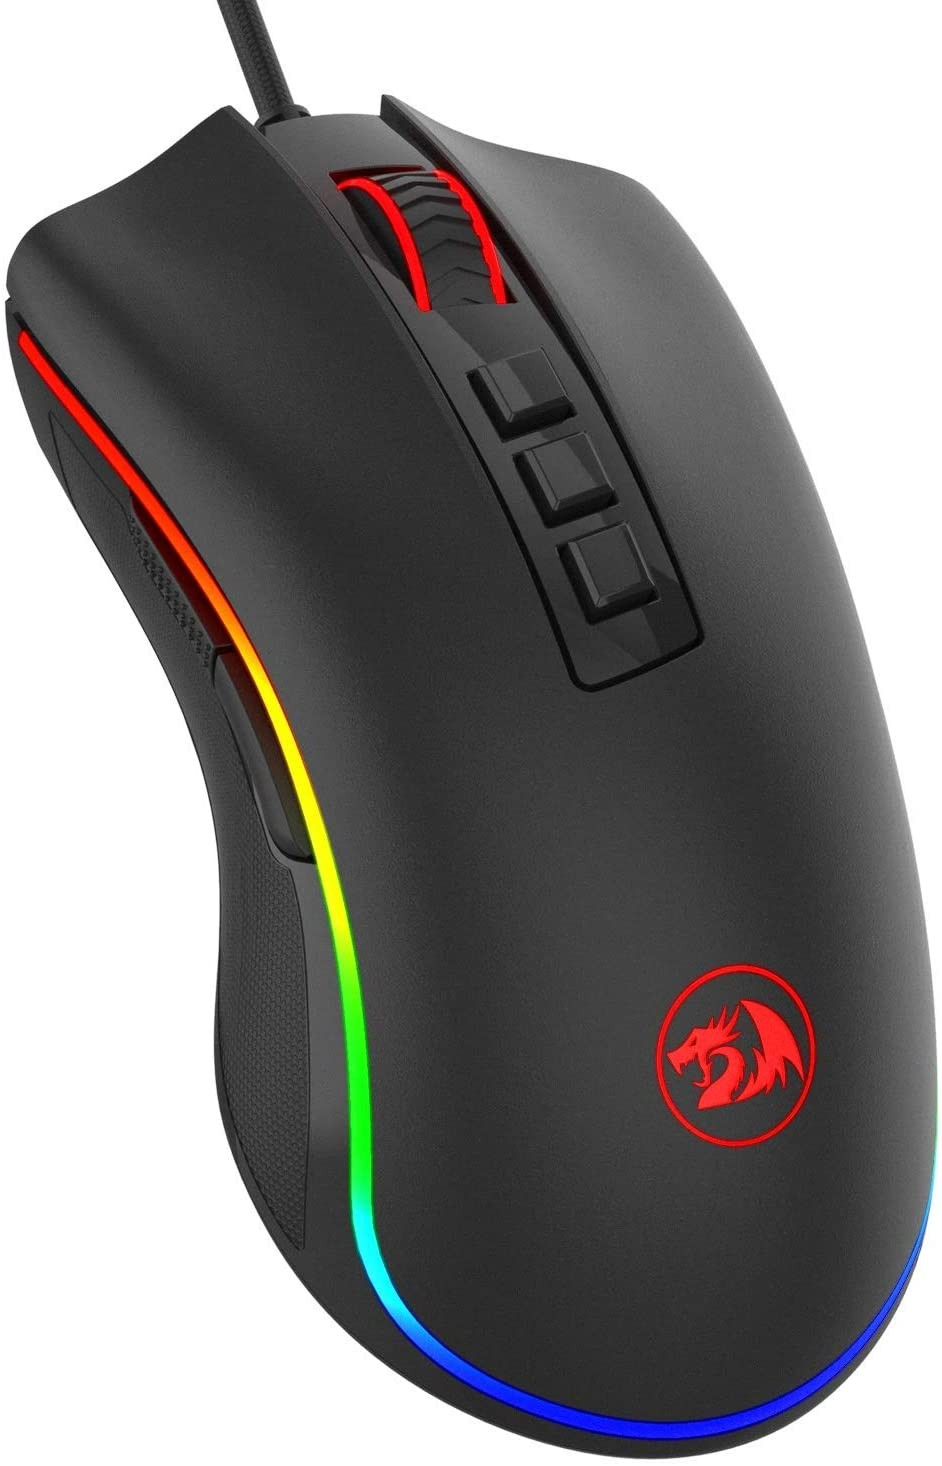 Redragon M711 Cobra Gaming Mouse with 16.8 Million RGB Color Backlit, 10,000 DPI Adjustable